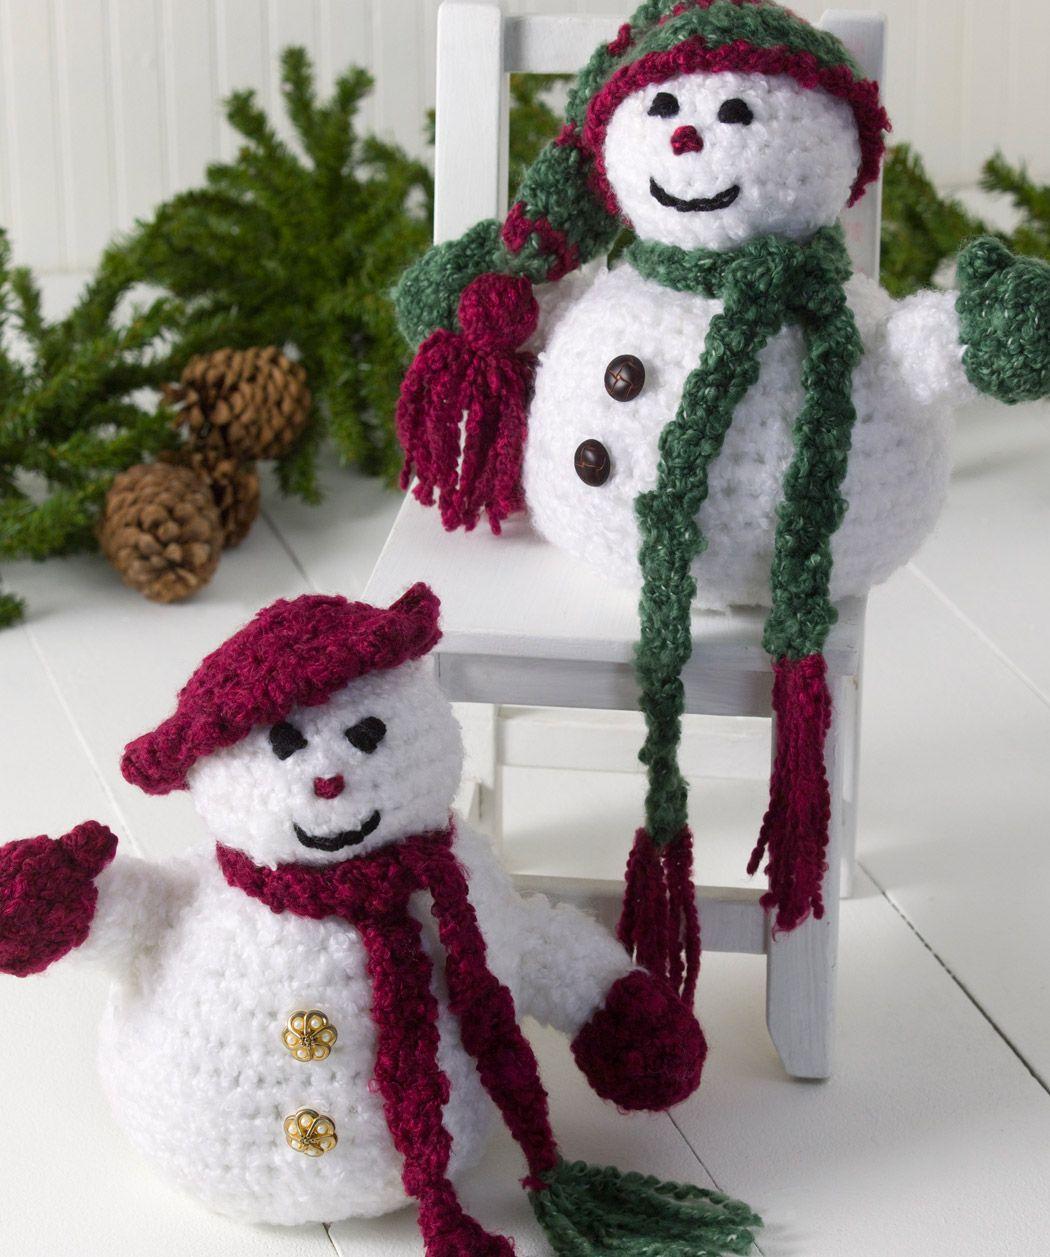 Mr Mrs Frosty Christmas Crochet Patterns Crochet Xmas Holiday Crochet